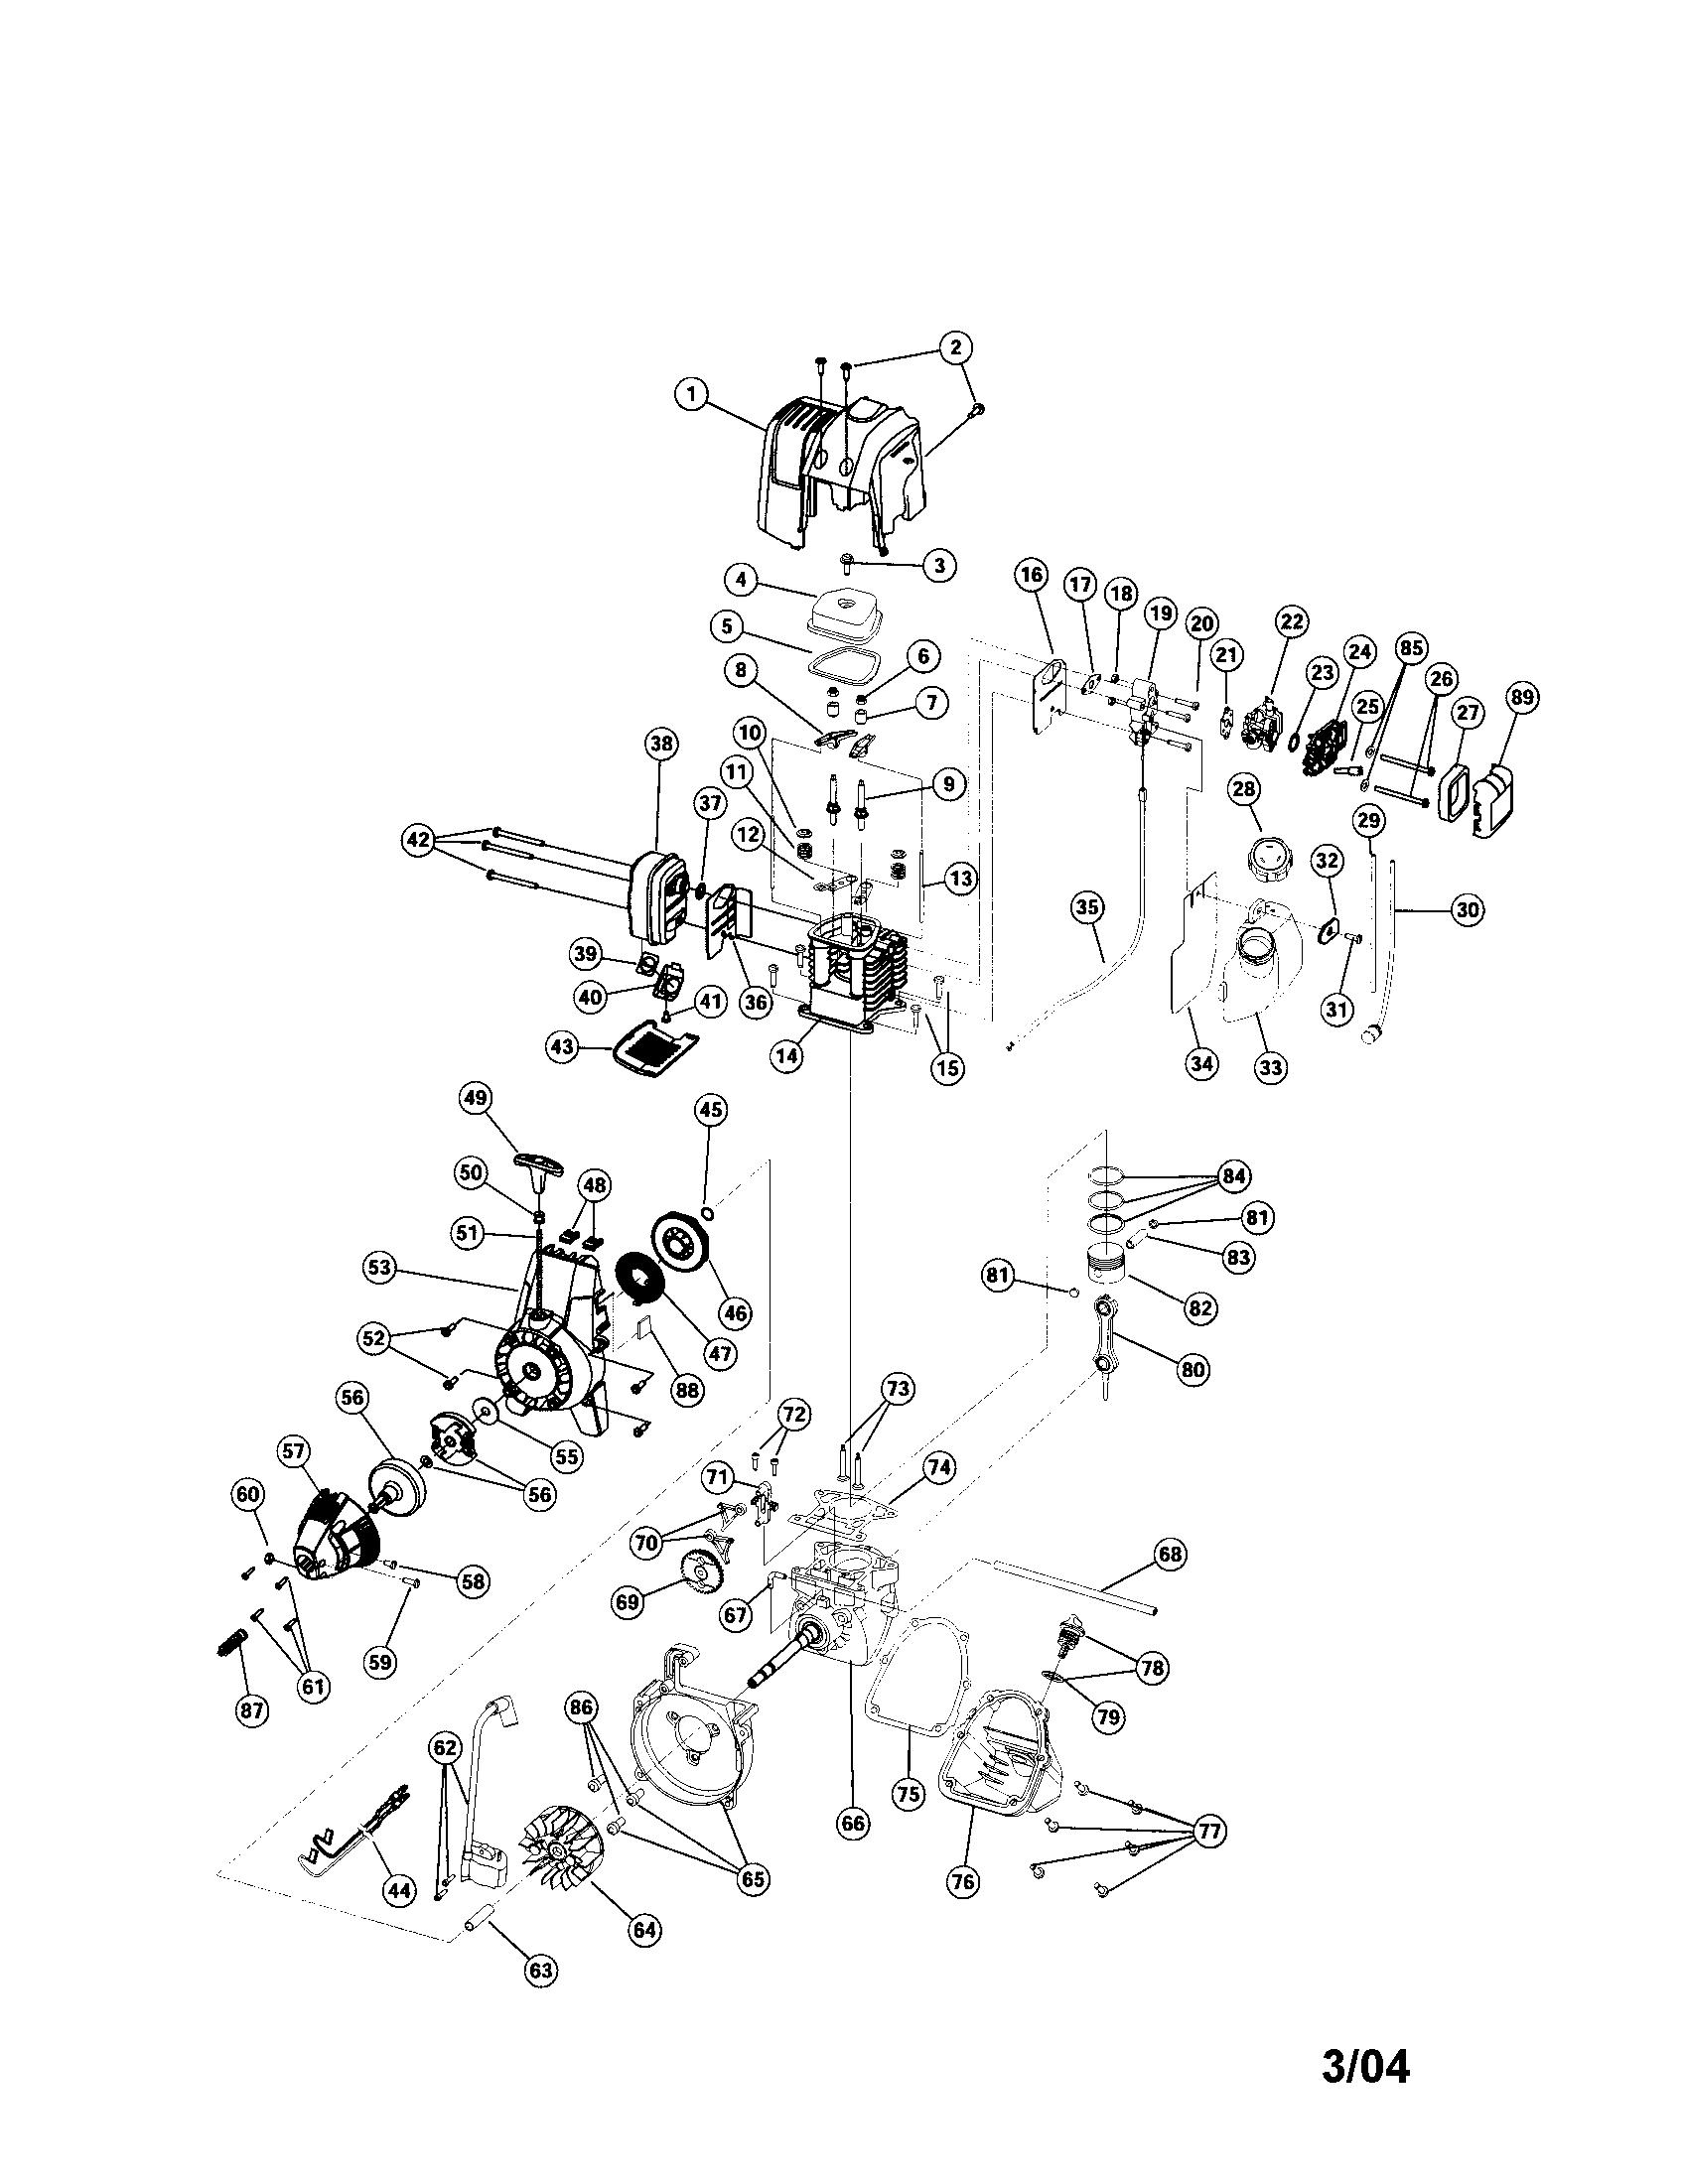 Troybilt model TB425CS line trimmers/weedwackers, gas